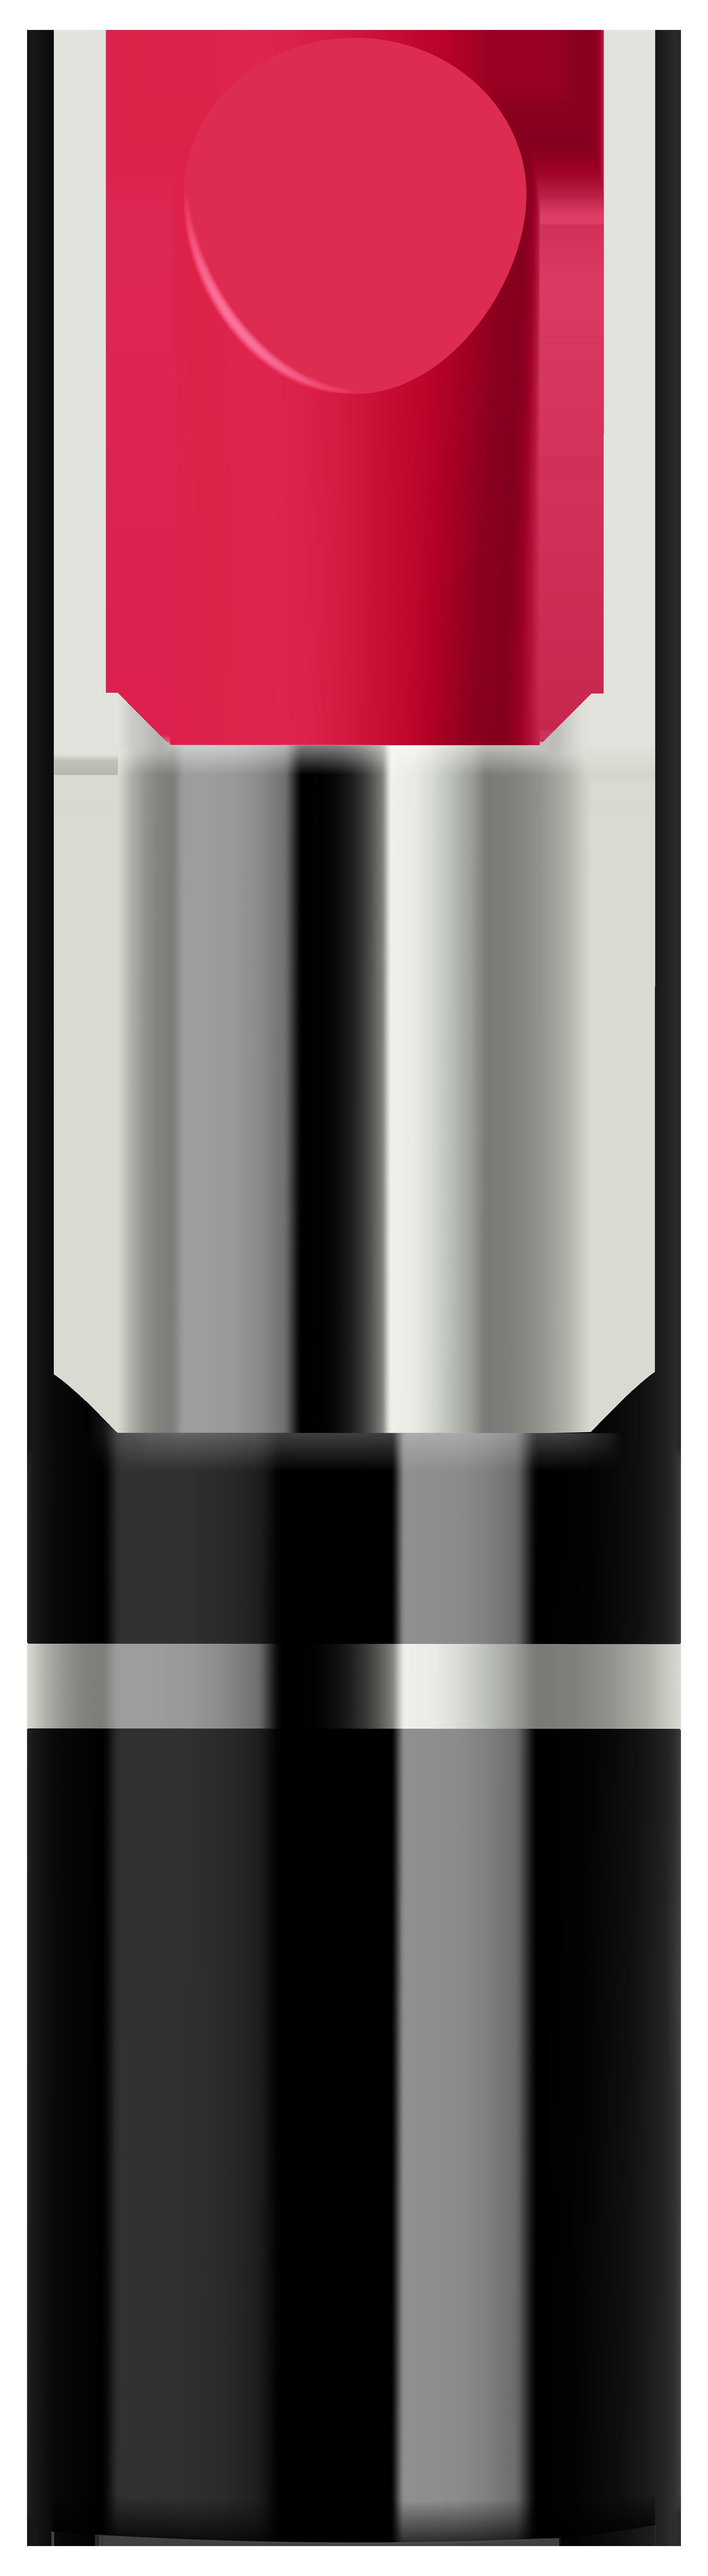 Red png clip art. Lipstick clipart transparent background